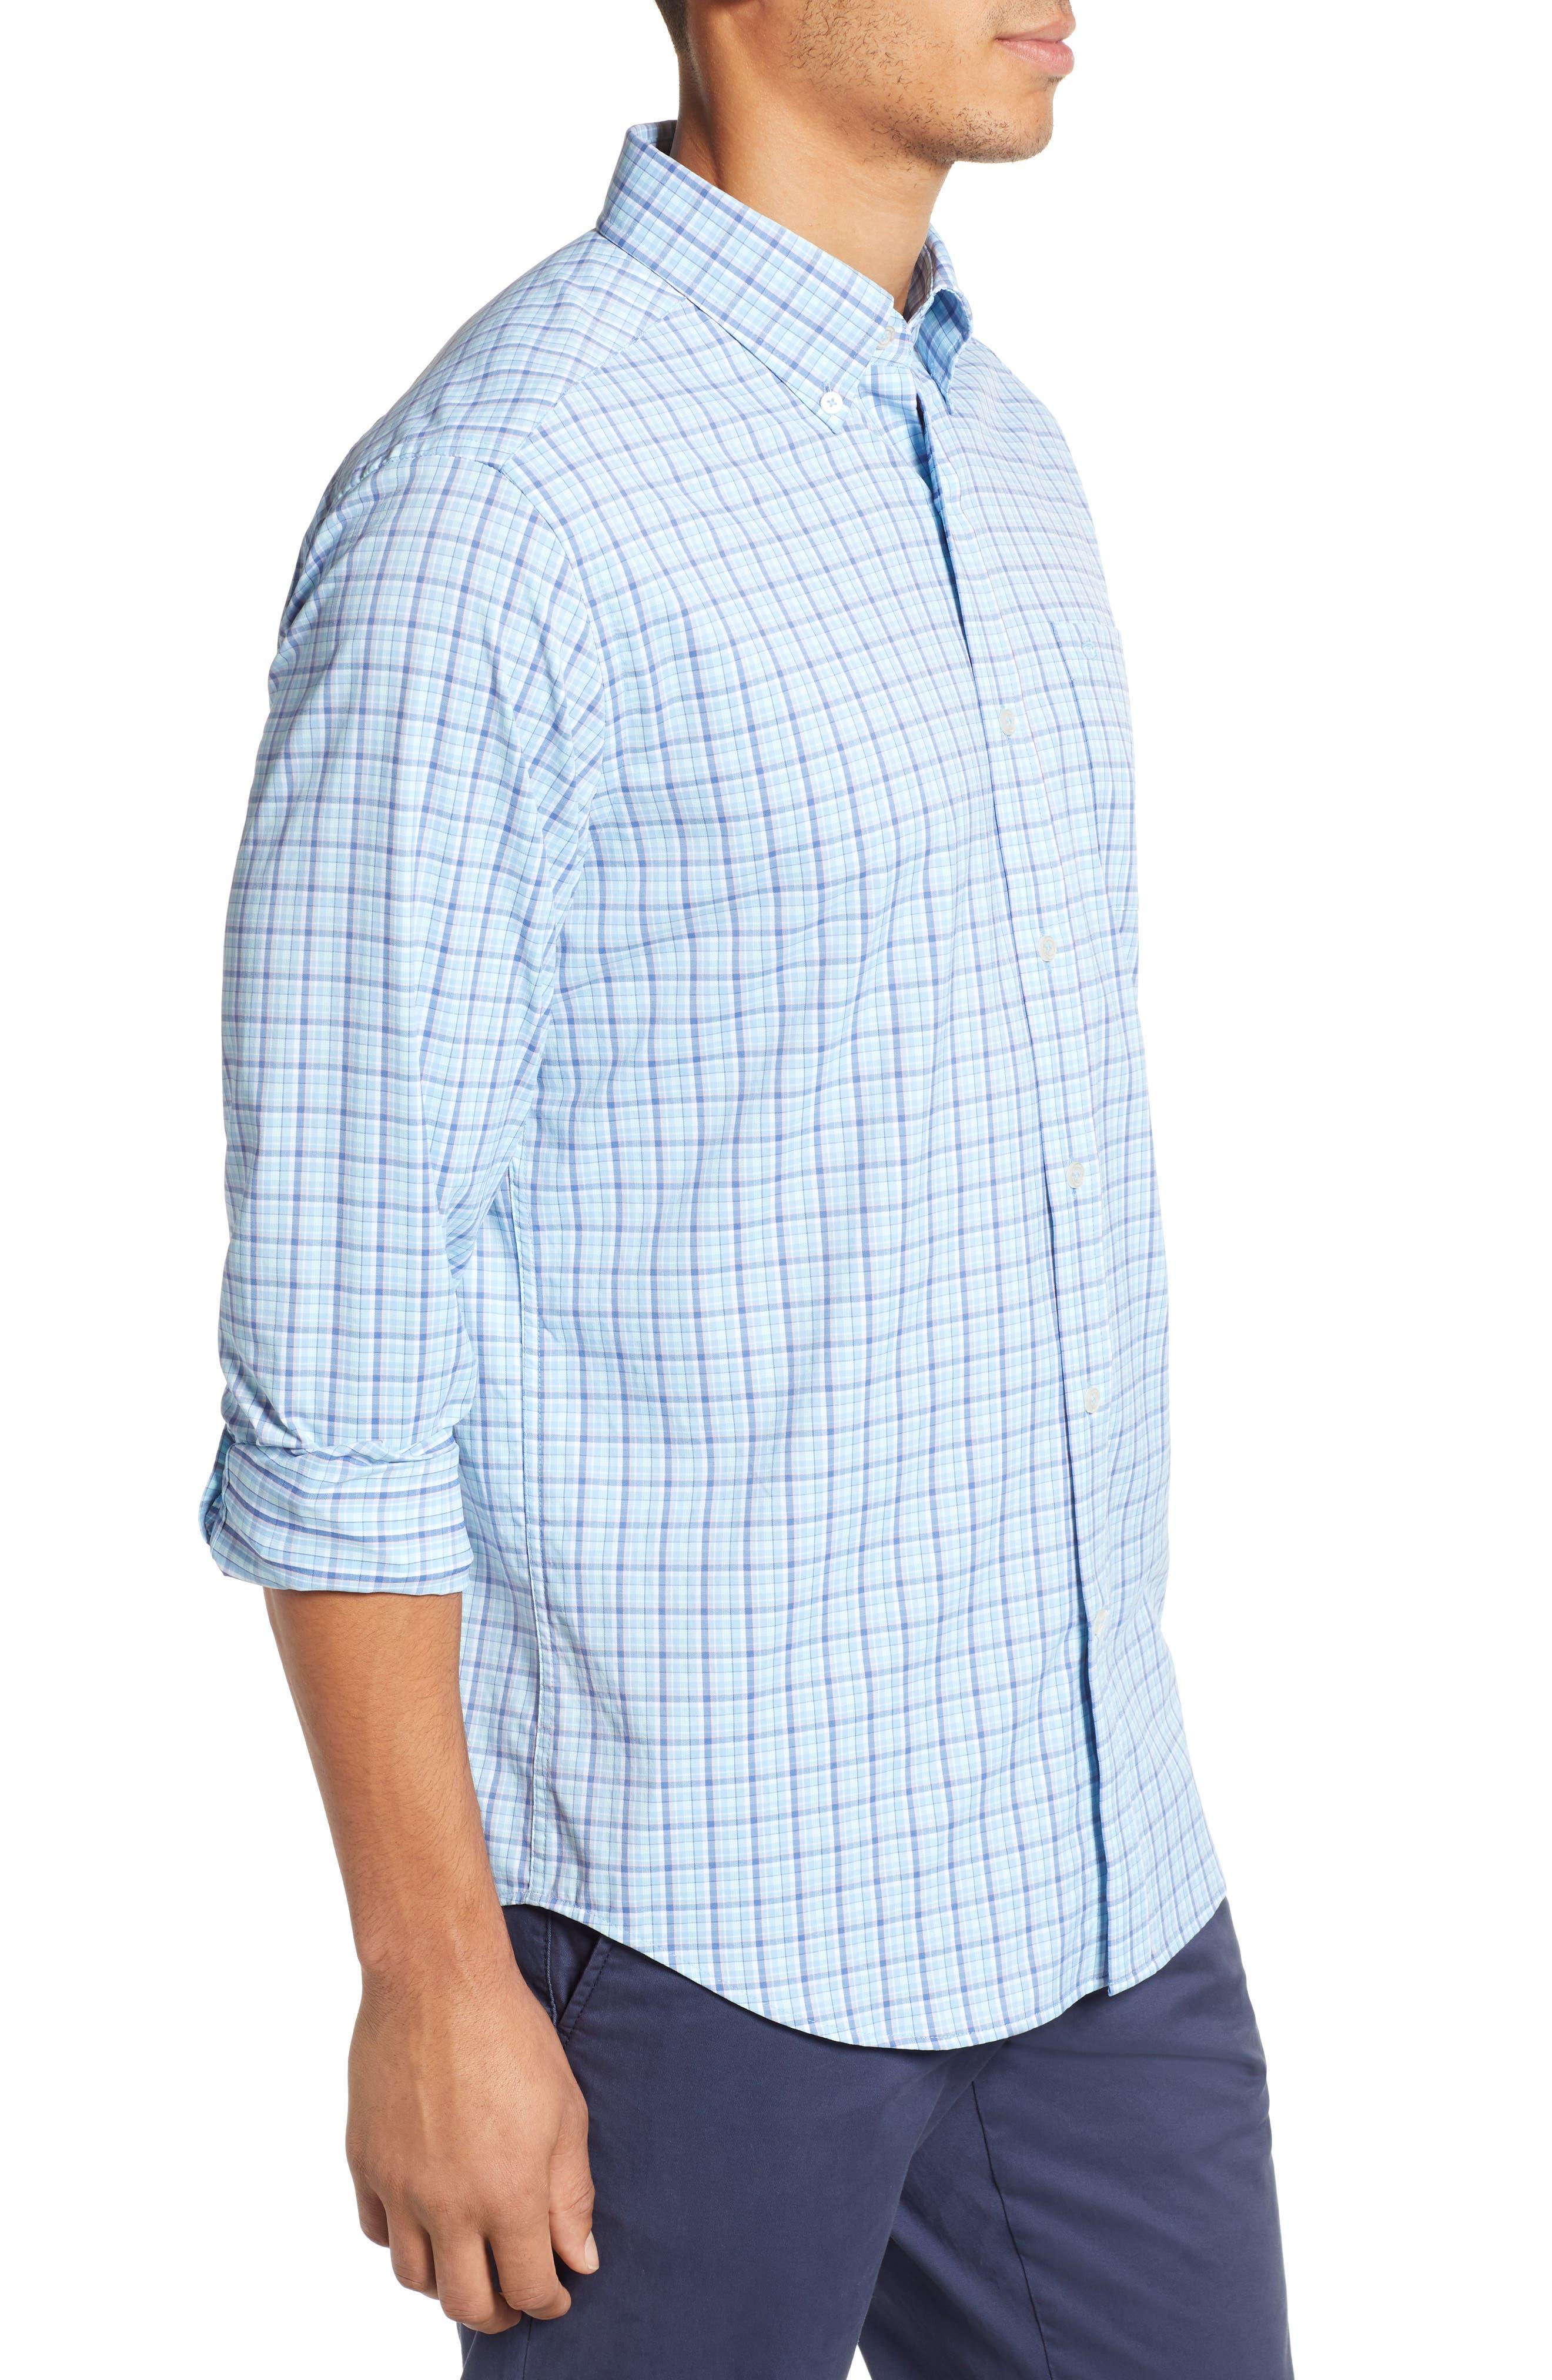 Staycation Intercoastal Regular Fit Plaid Performance Sport Shirt,                             Alternate thumbnail 4, color,                             SKY BLUE